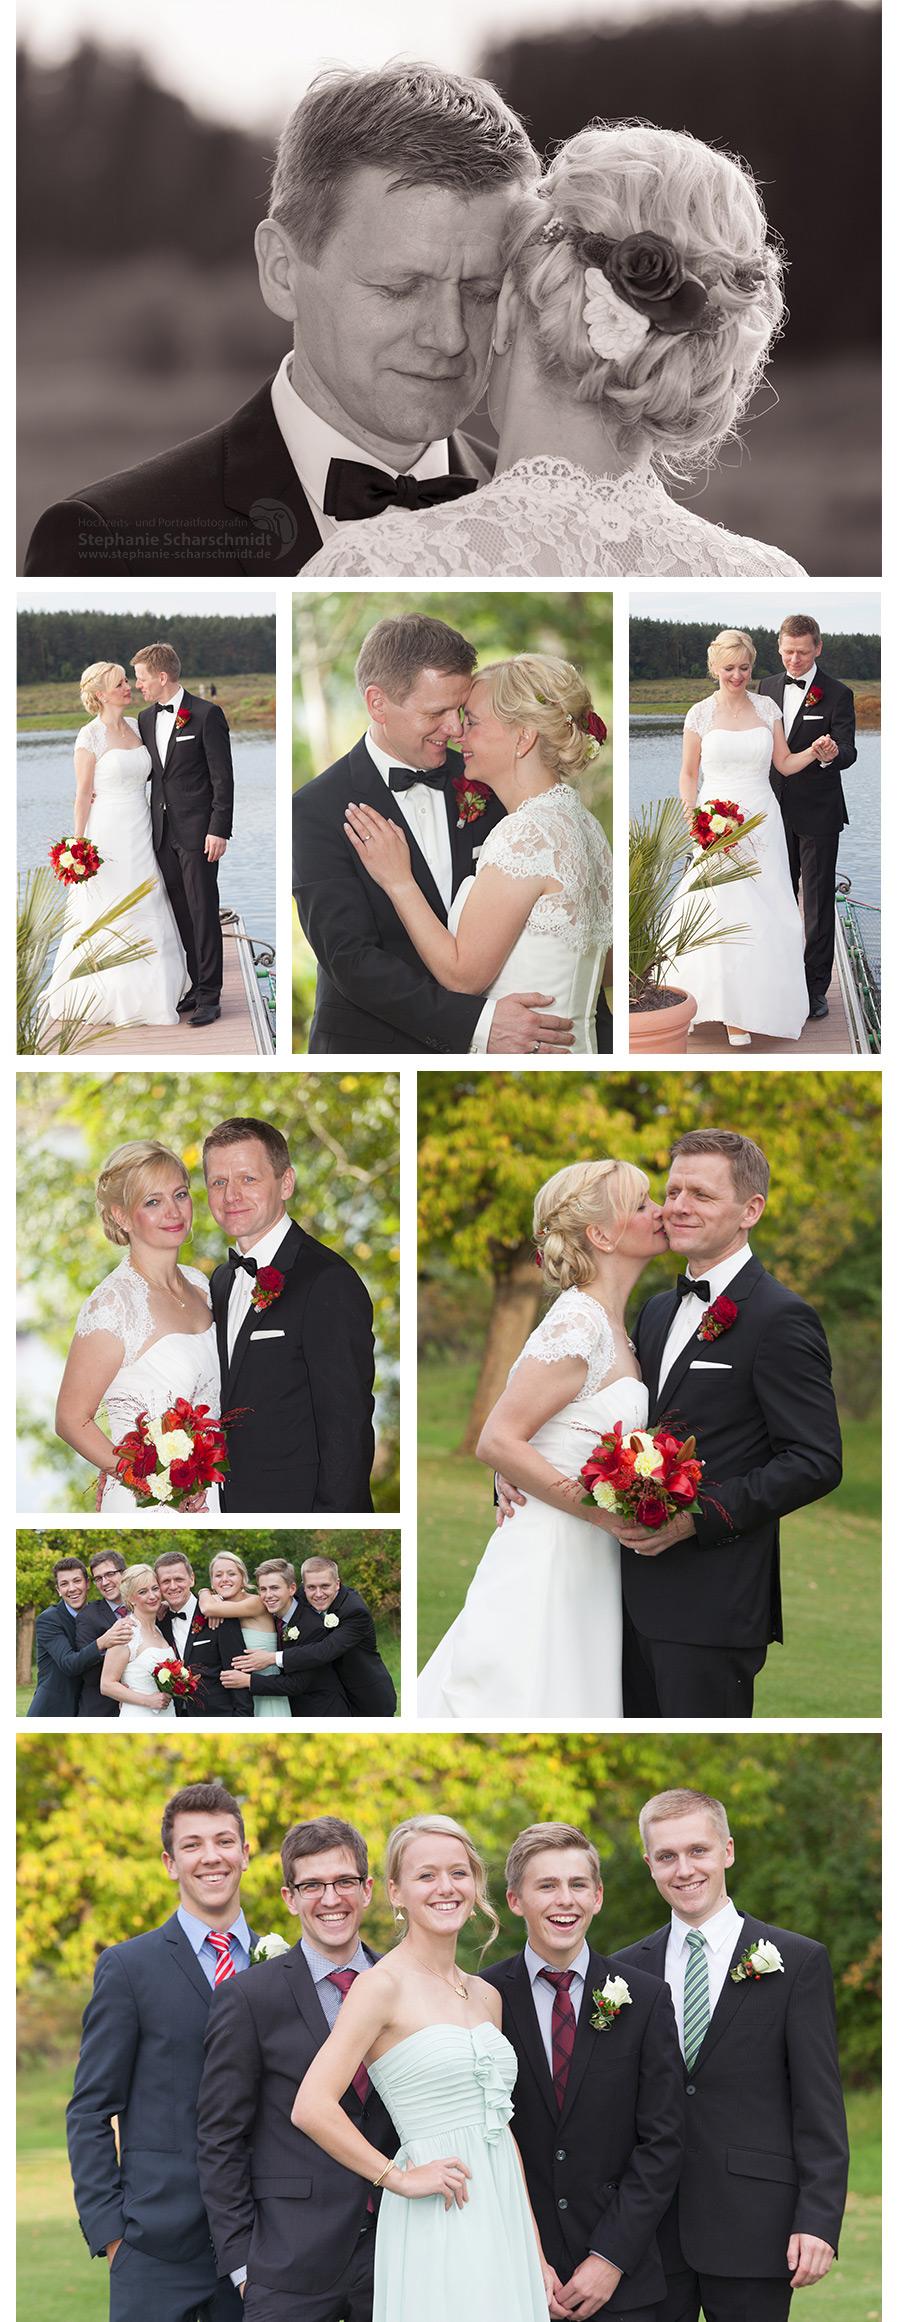 5. Hochzeitsfotos im Bio Seehotel Zeulenroda - Hochzeitsfotograf Bio-Seehotel Zeulenroda- Hochzeits- und Portraitfotografin Stephanie Scharschmidt - Hochzeitsfotograf Bio-Seehotel Zeulenroda –